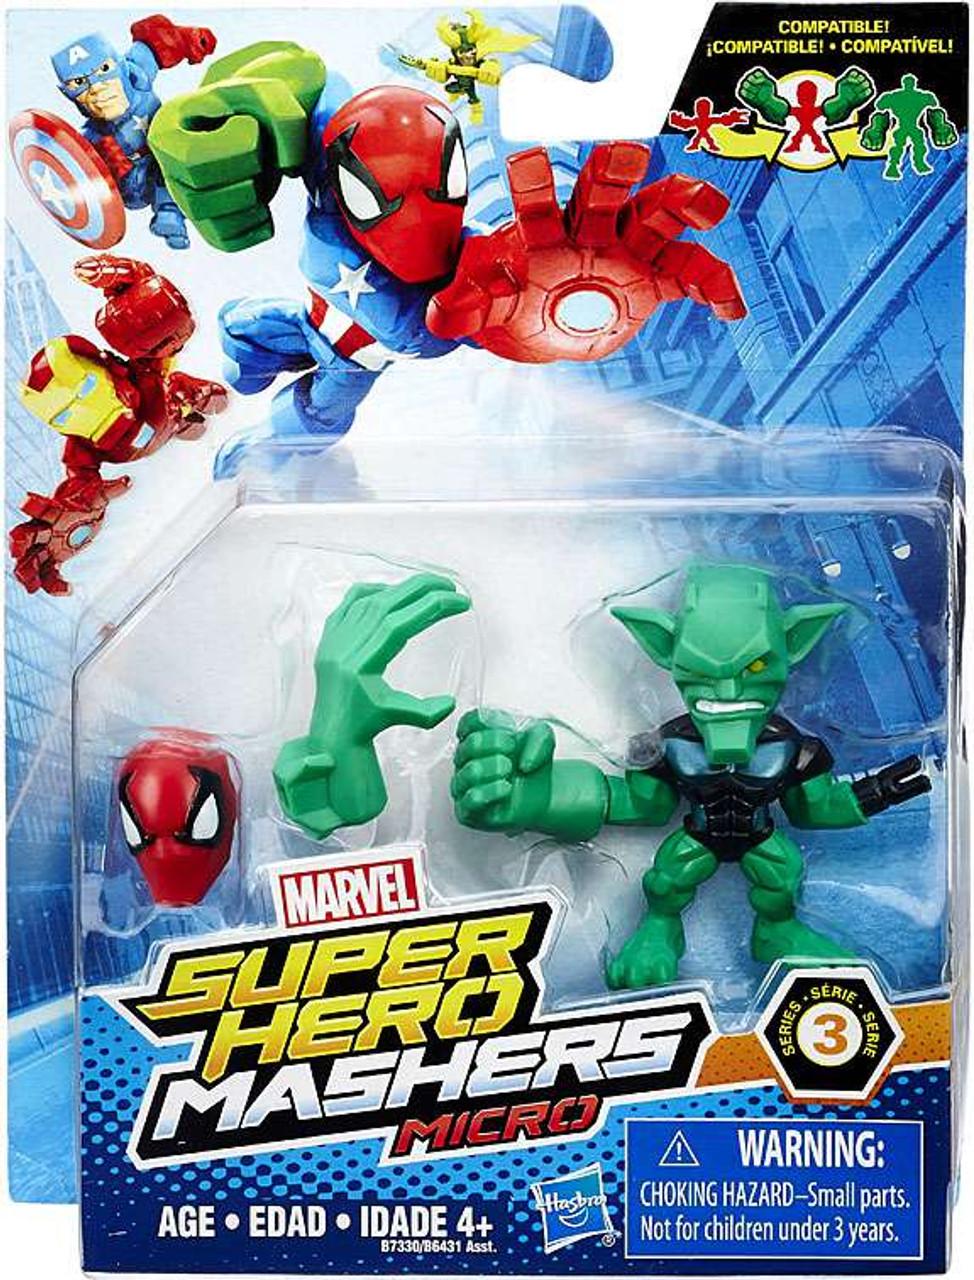 Marvel Super Hero Mashers Micro Series 3 Ultimate Goblin 2 Mini